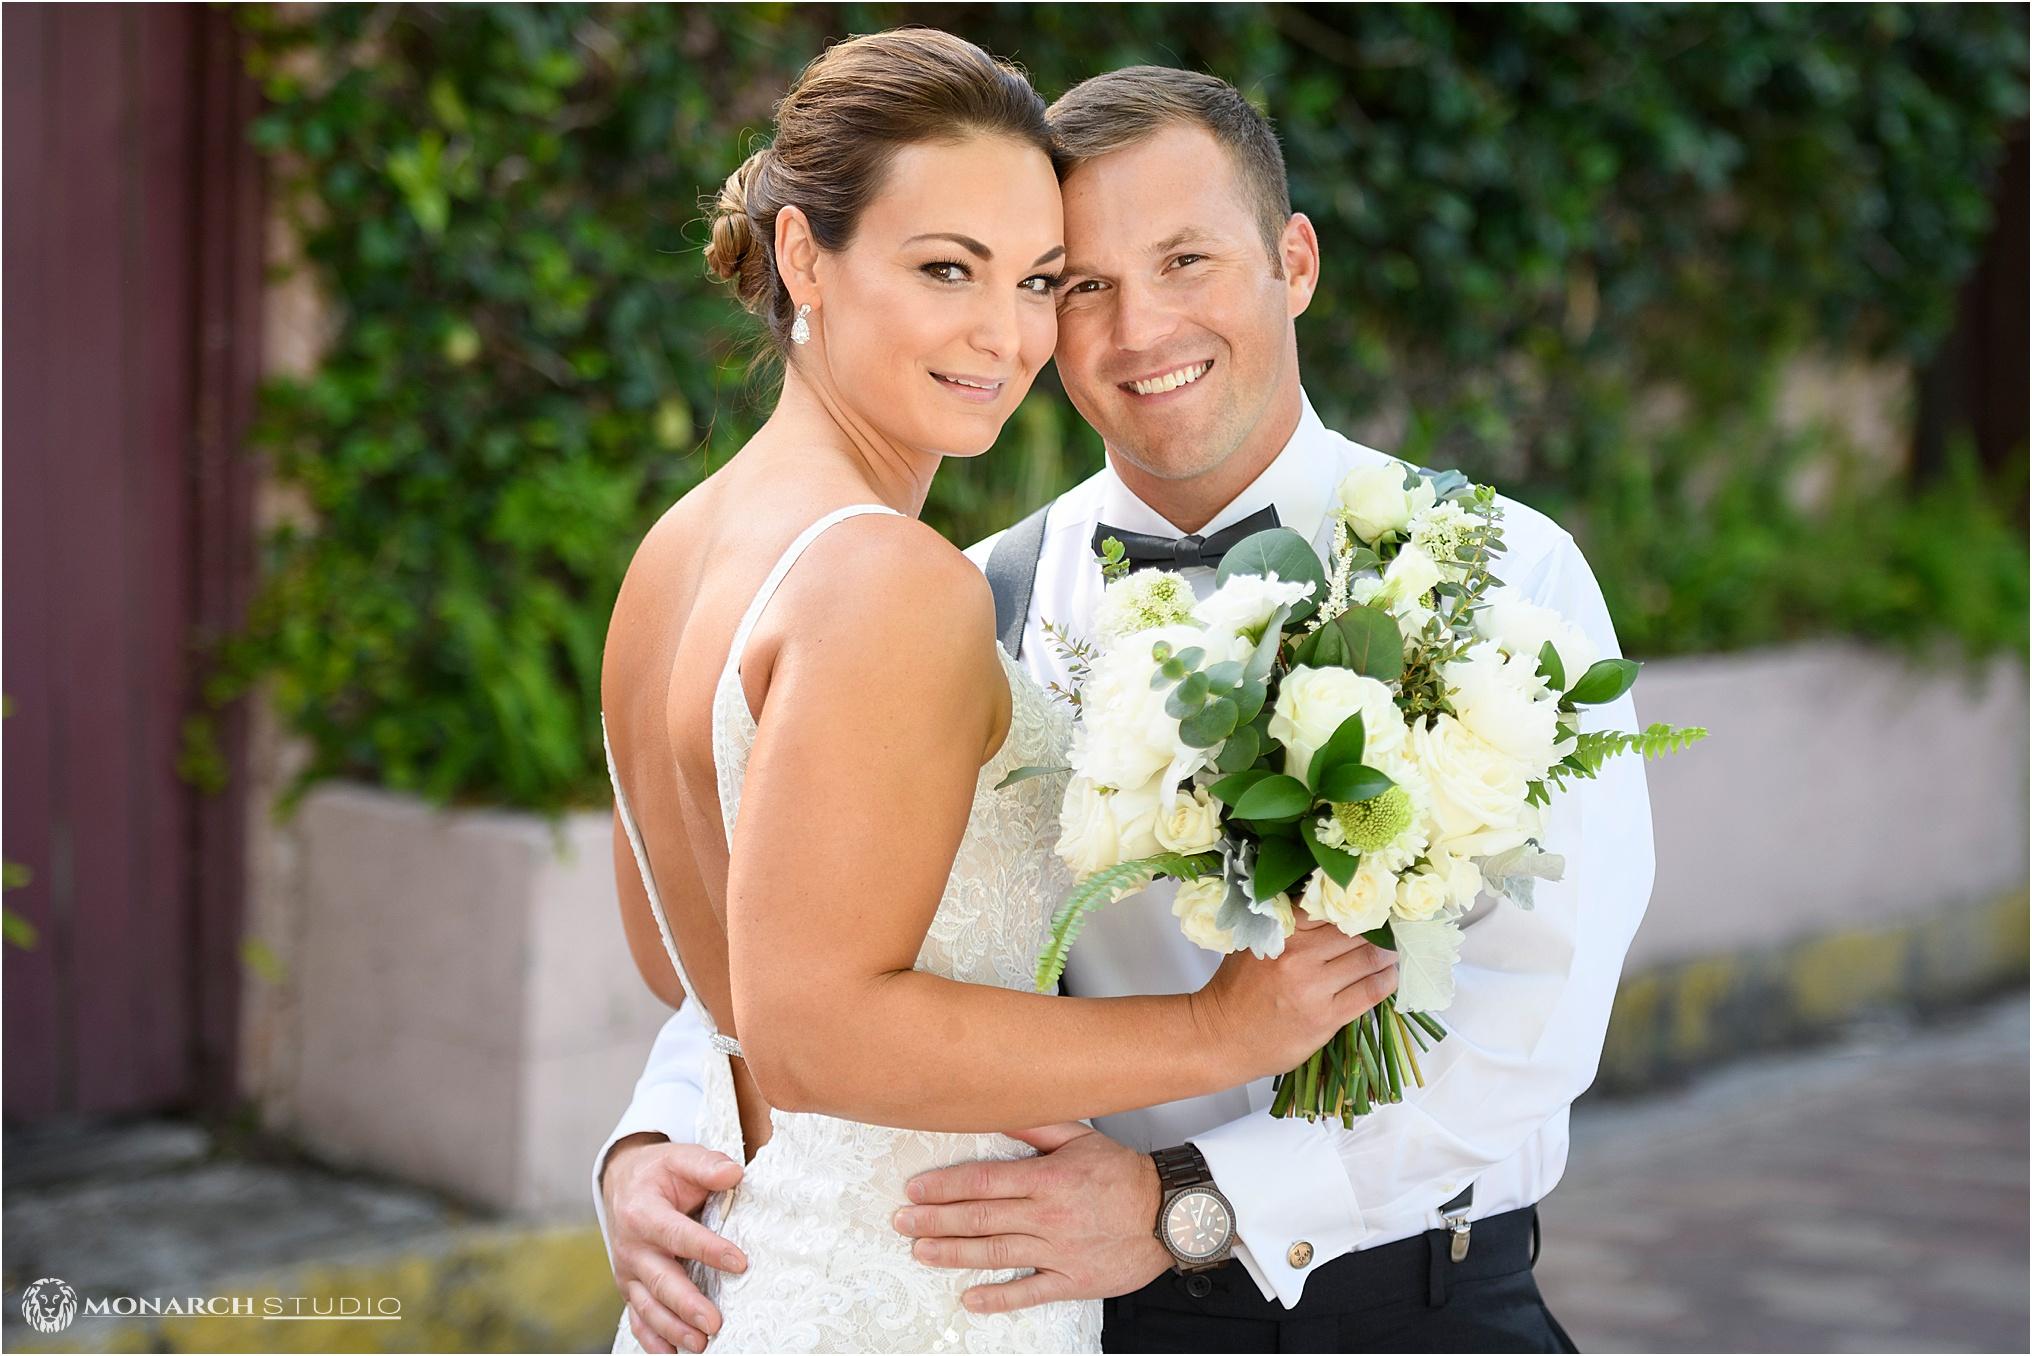 043-whiteroom-wedding-photographer-2019-05-22_0025.jpg